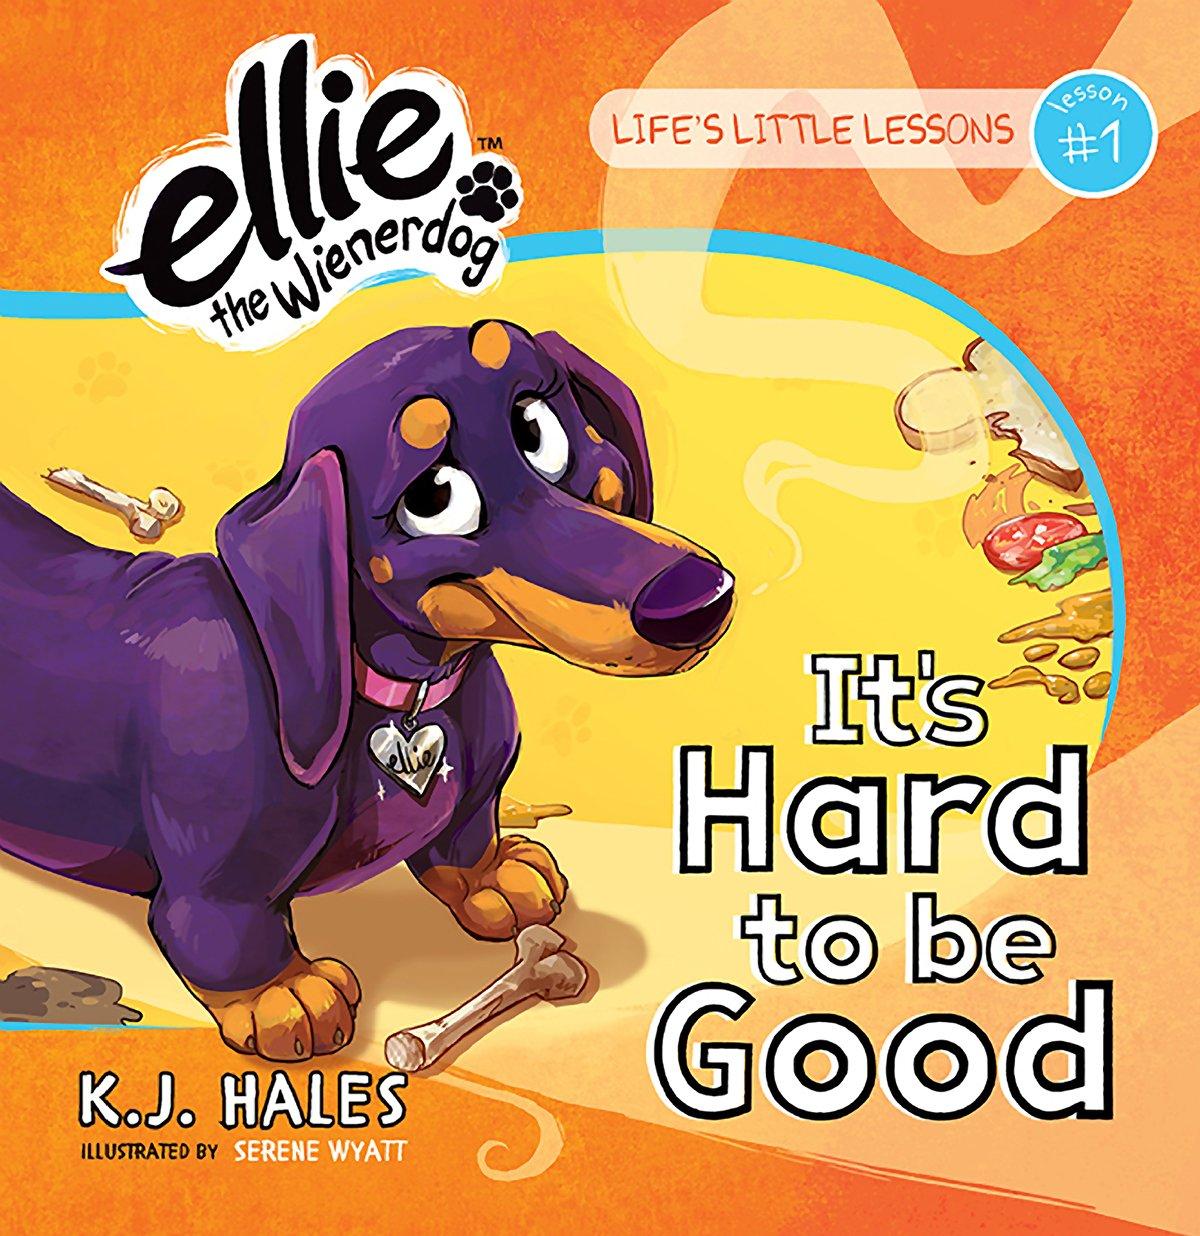 It's Hard to be Good (Ellie the Wienerdog) pdf epub